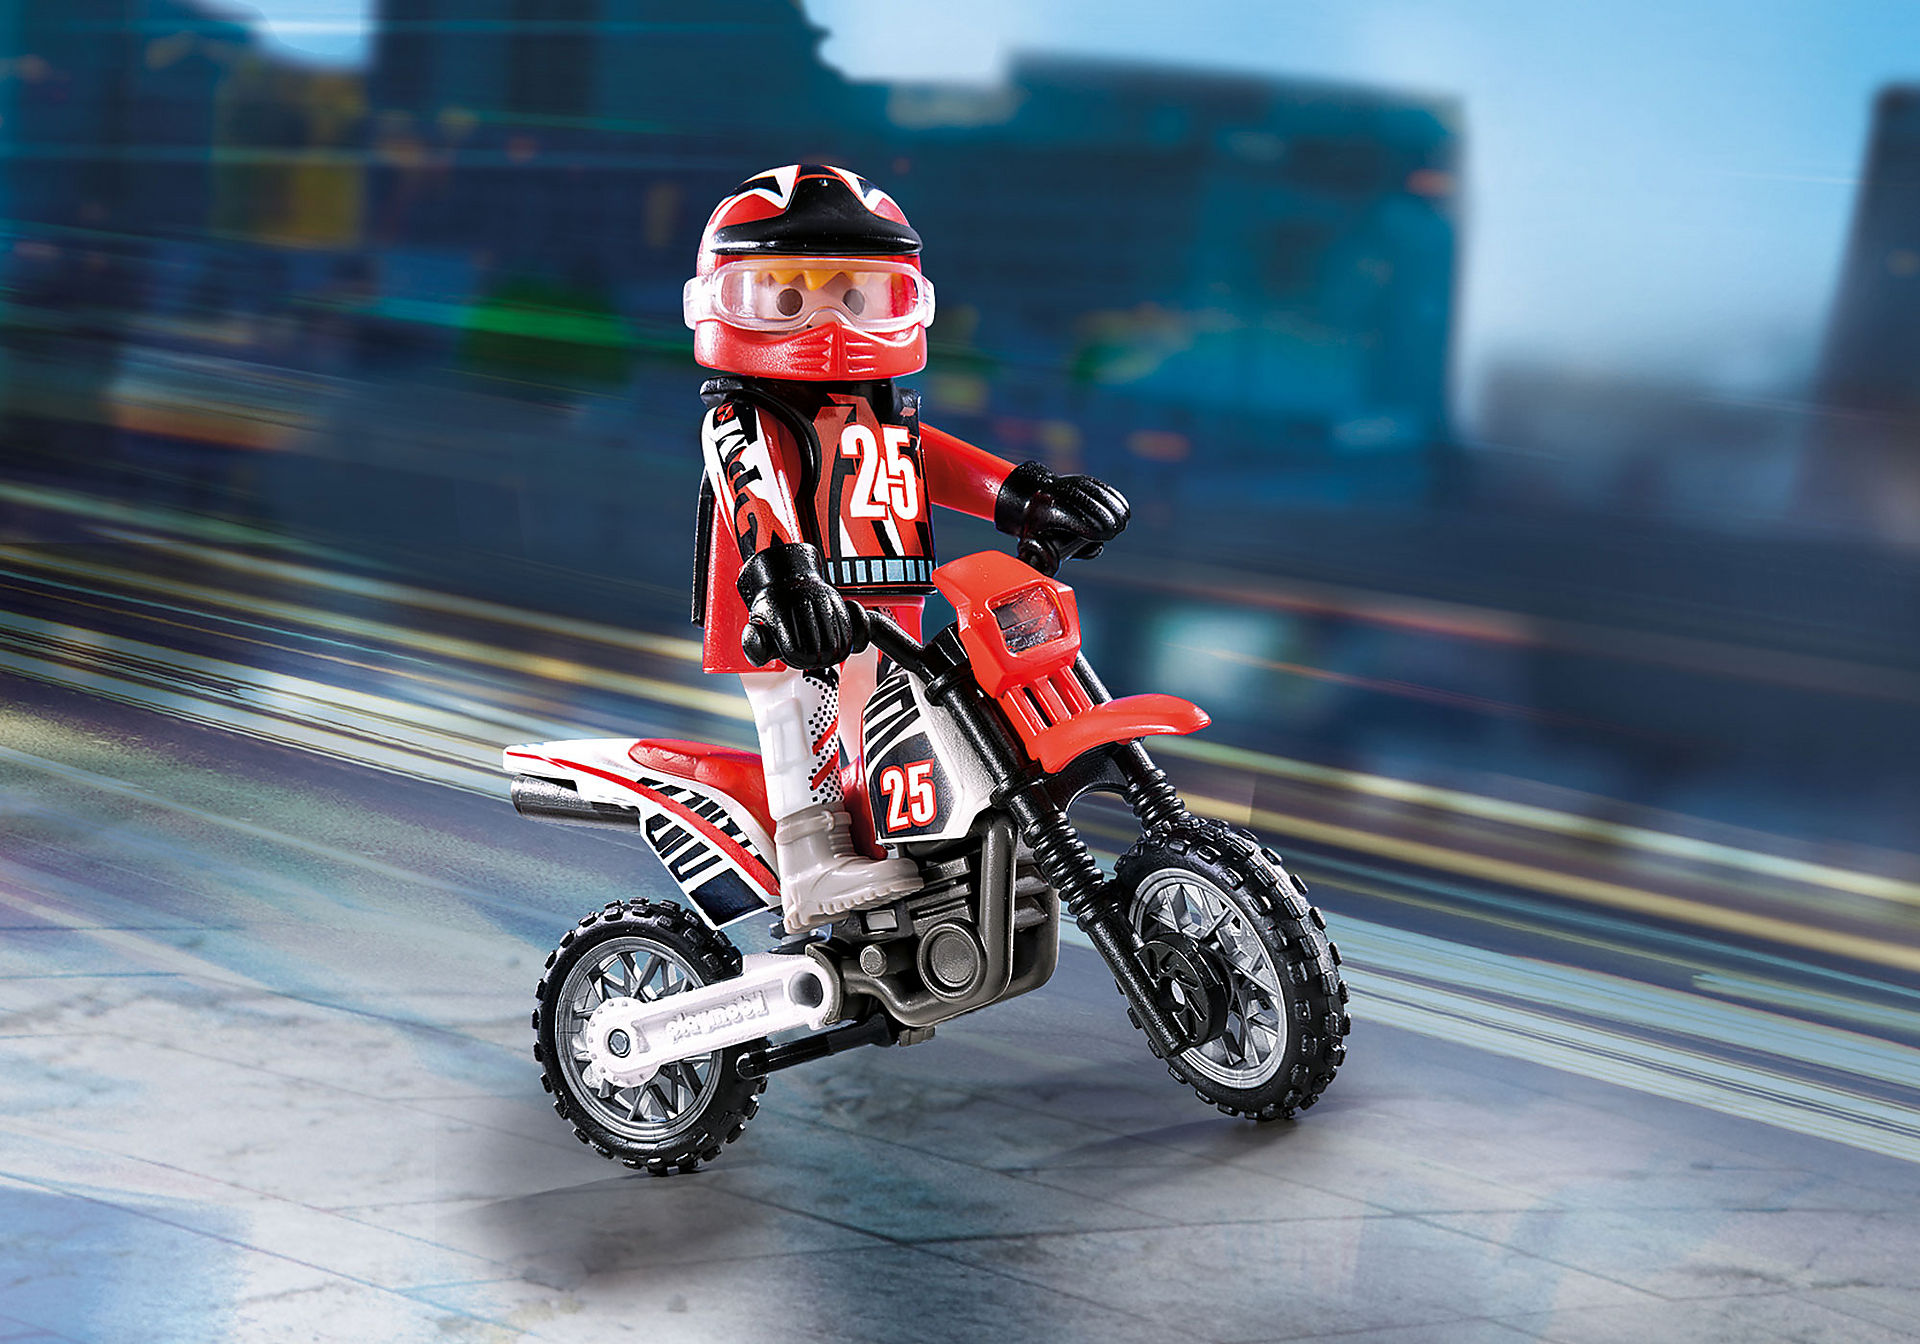 9357 Pilote de motocross  zoom image1